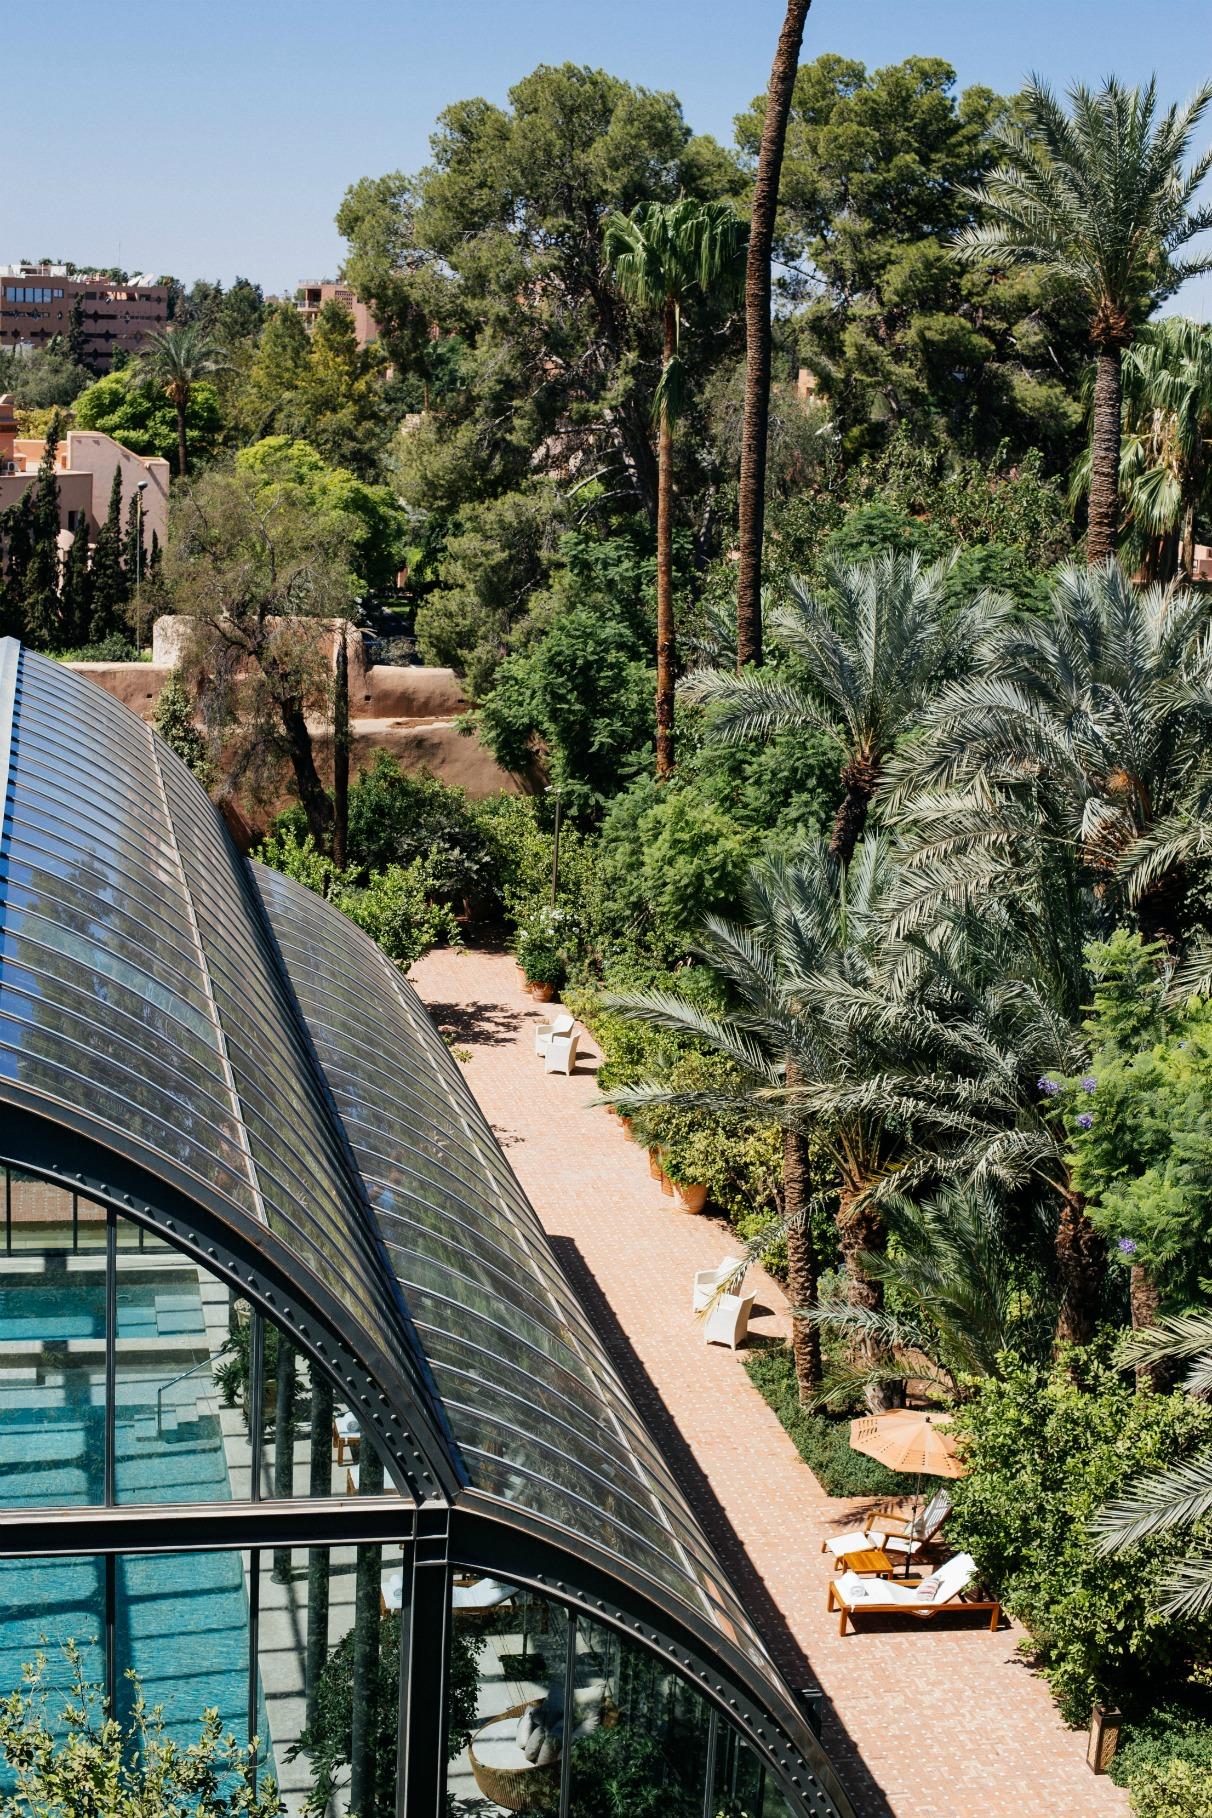 royal-mansour-hotel-luxury-marrakesch-marrakesh-morocco-edisa-shahini-disicouture-blog-15